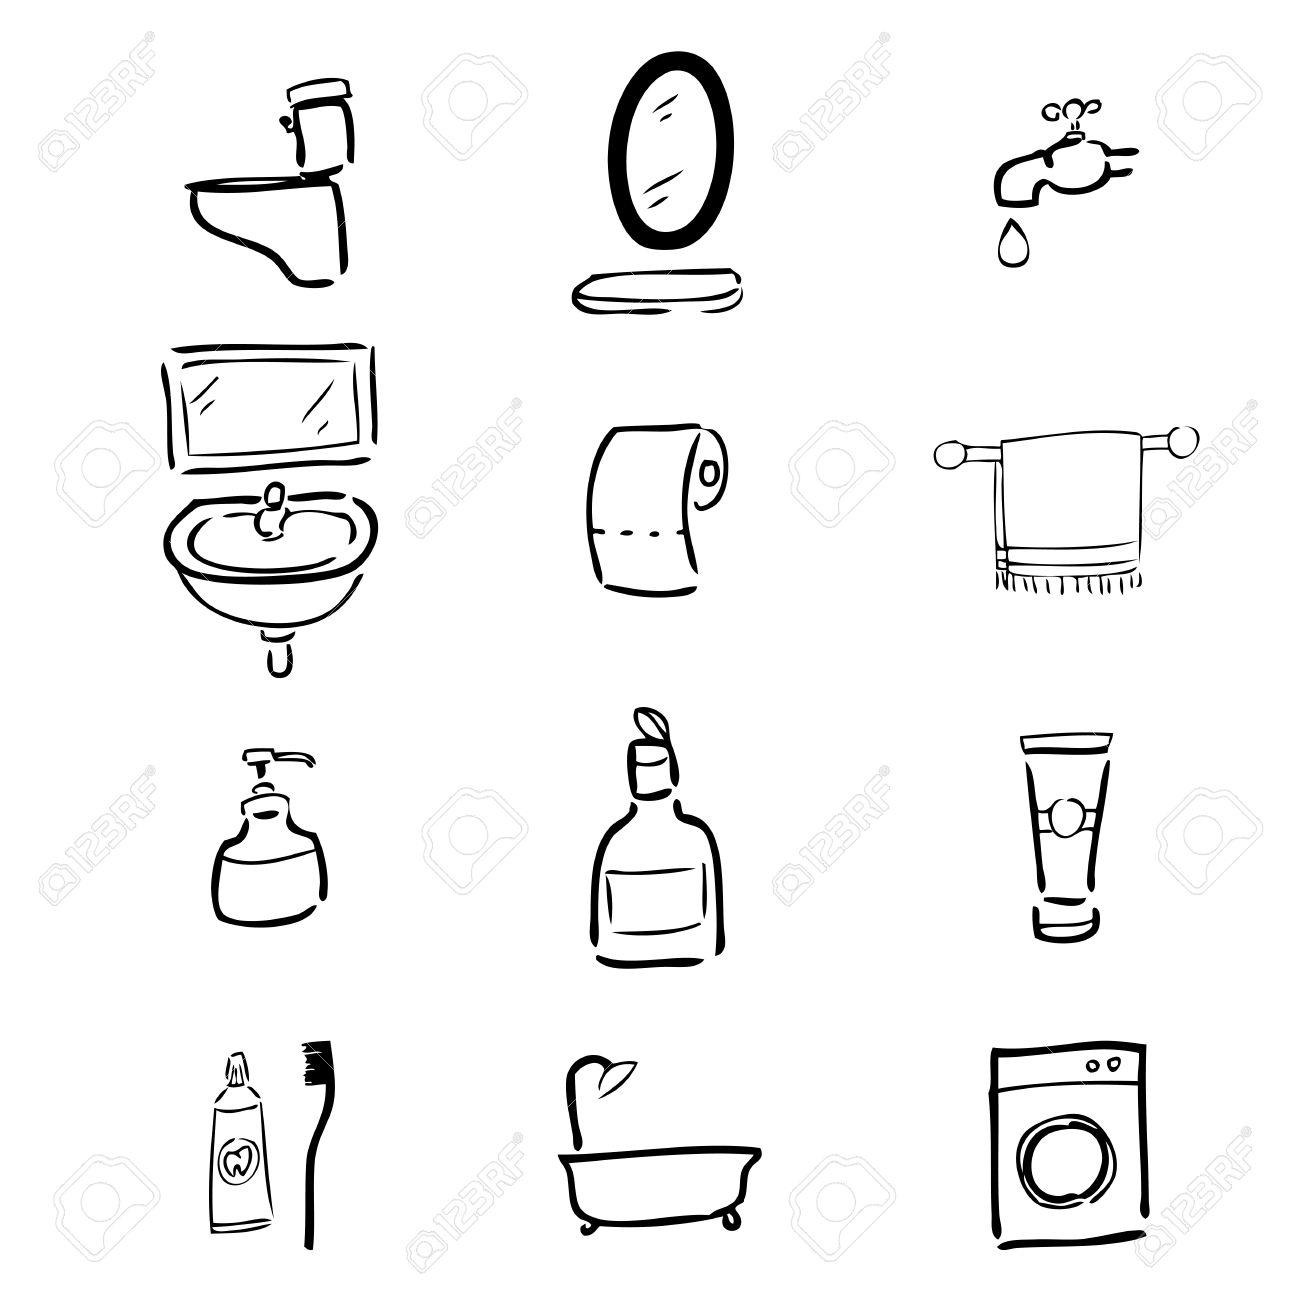 Toilet drawing icons set cartoon 2 Stock Vector   34488821Toilet Drawing Icons Set Cartoon 2 Royalty Free Cliparts  Vectors  . Toilet Drawing. Home Design Ideas